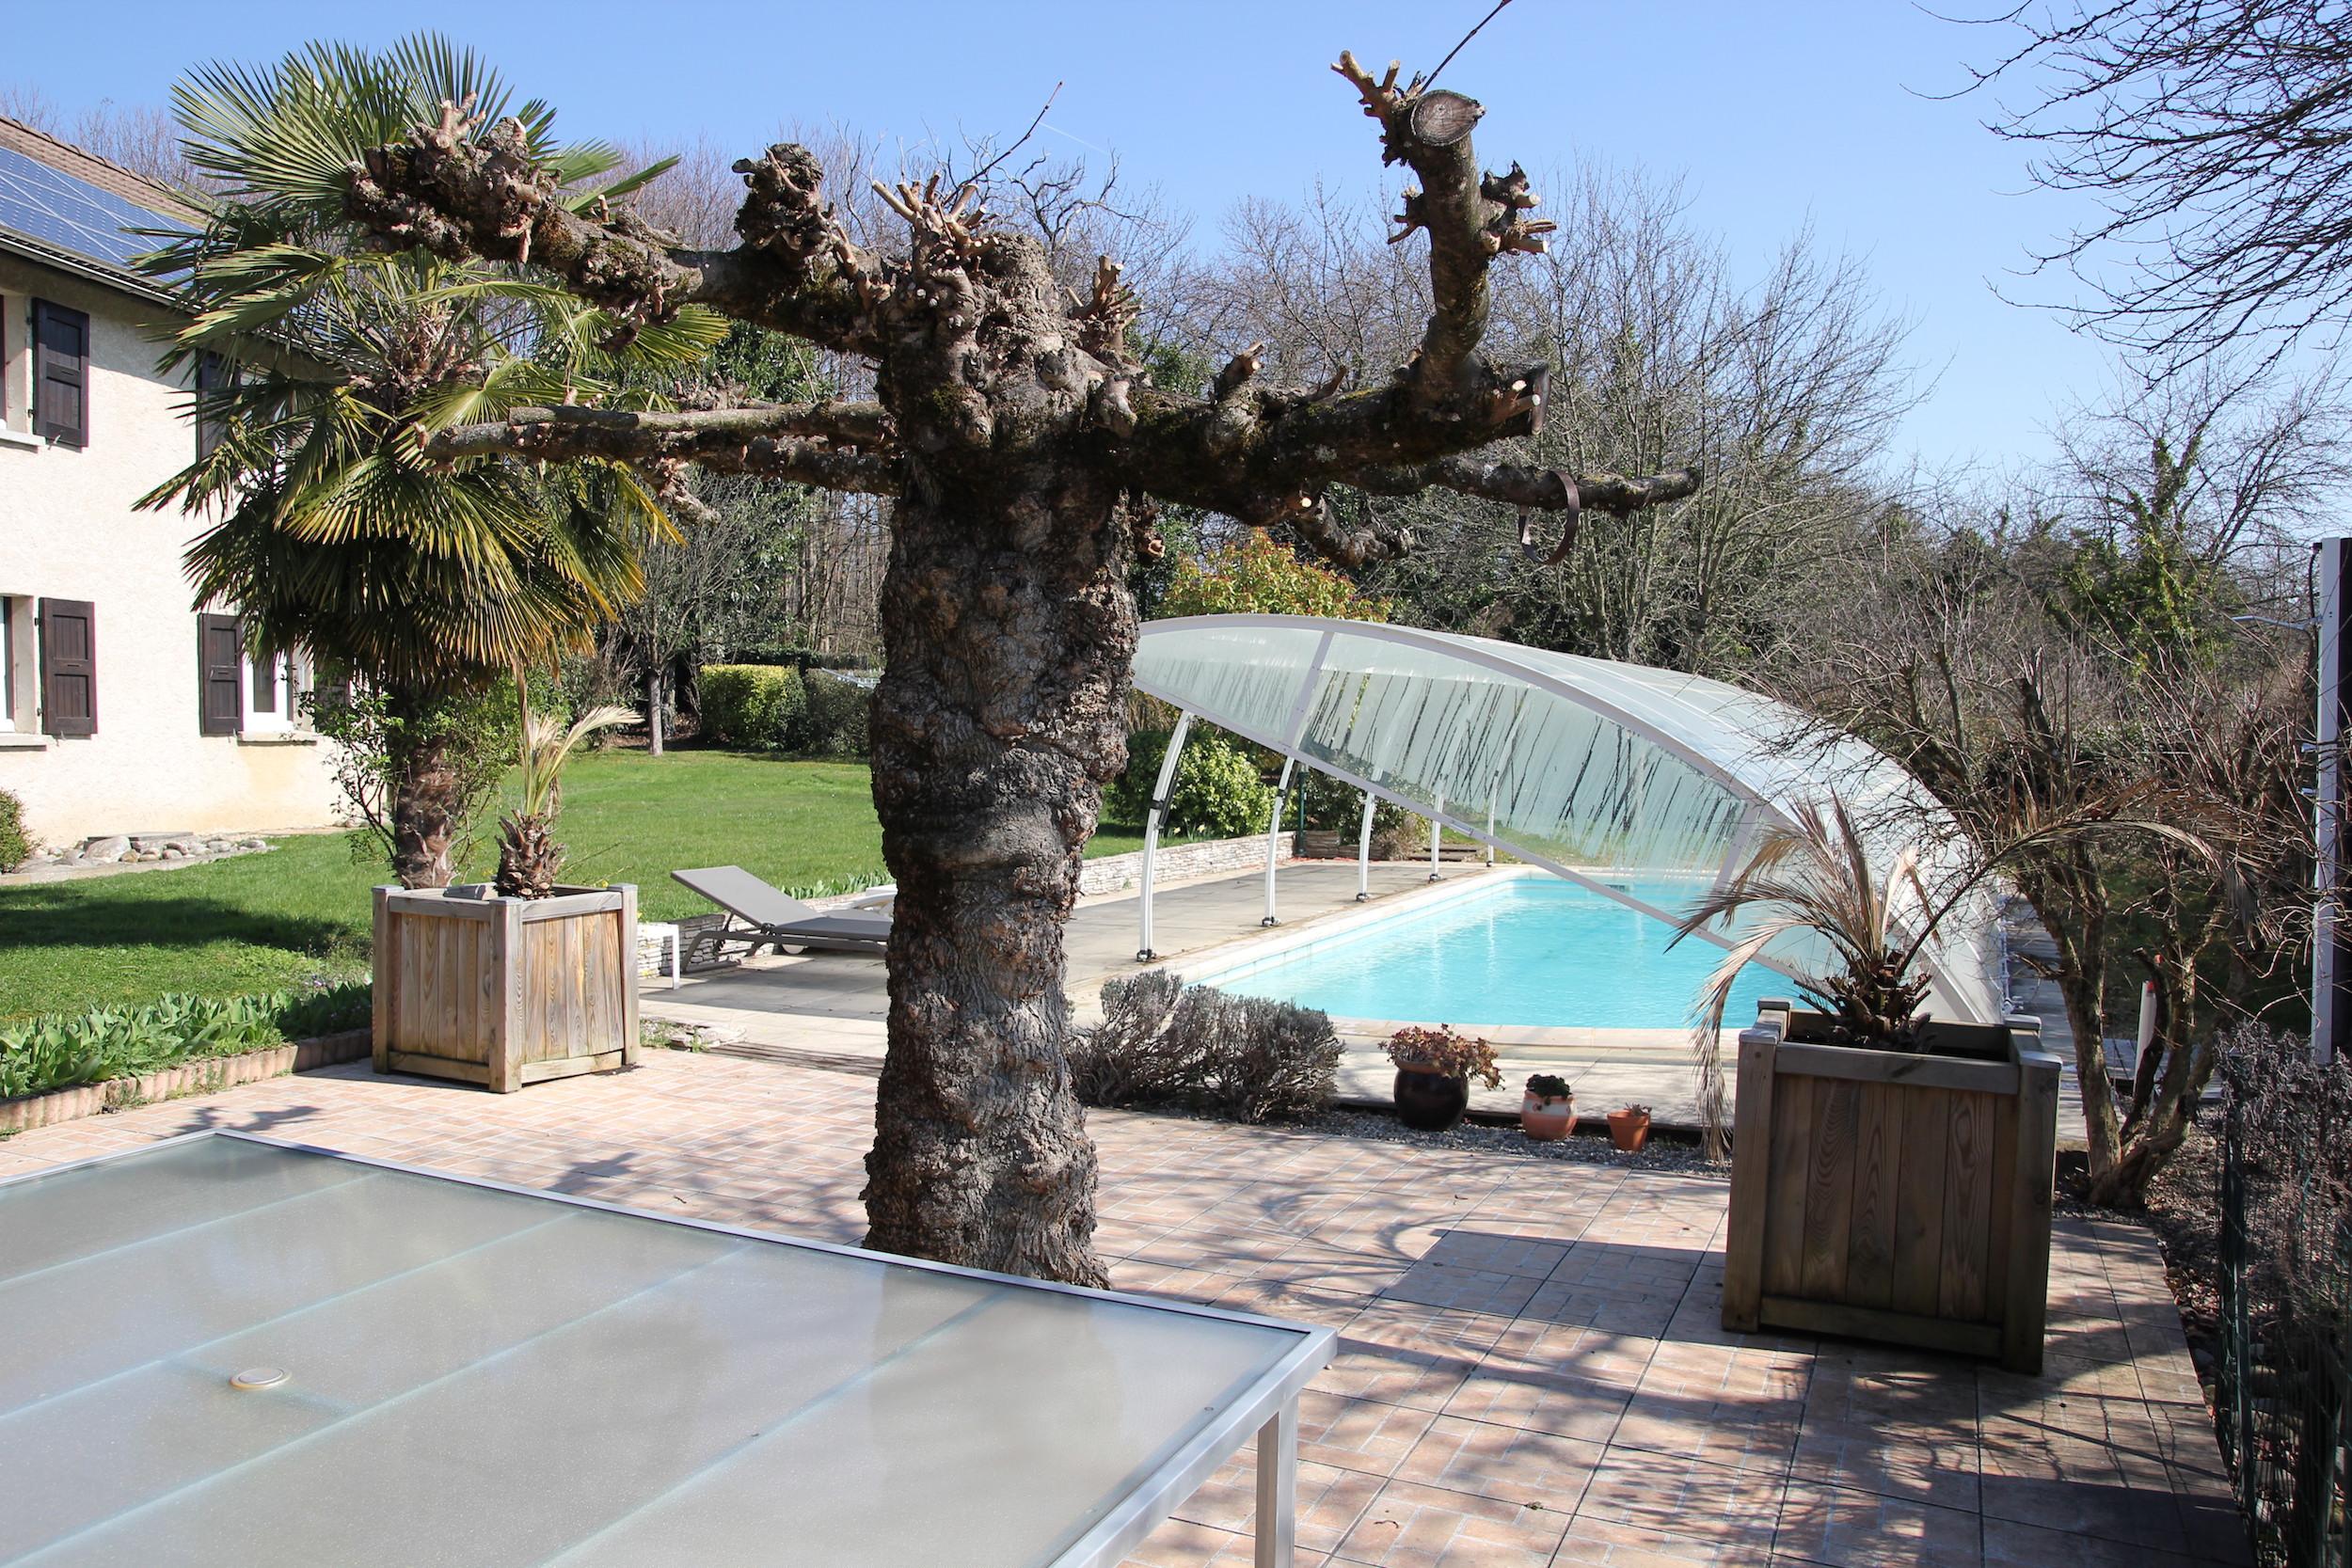 Terrasse et piscine couverte